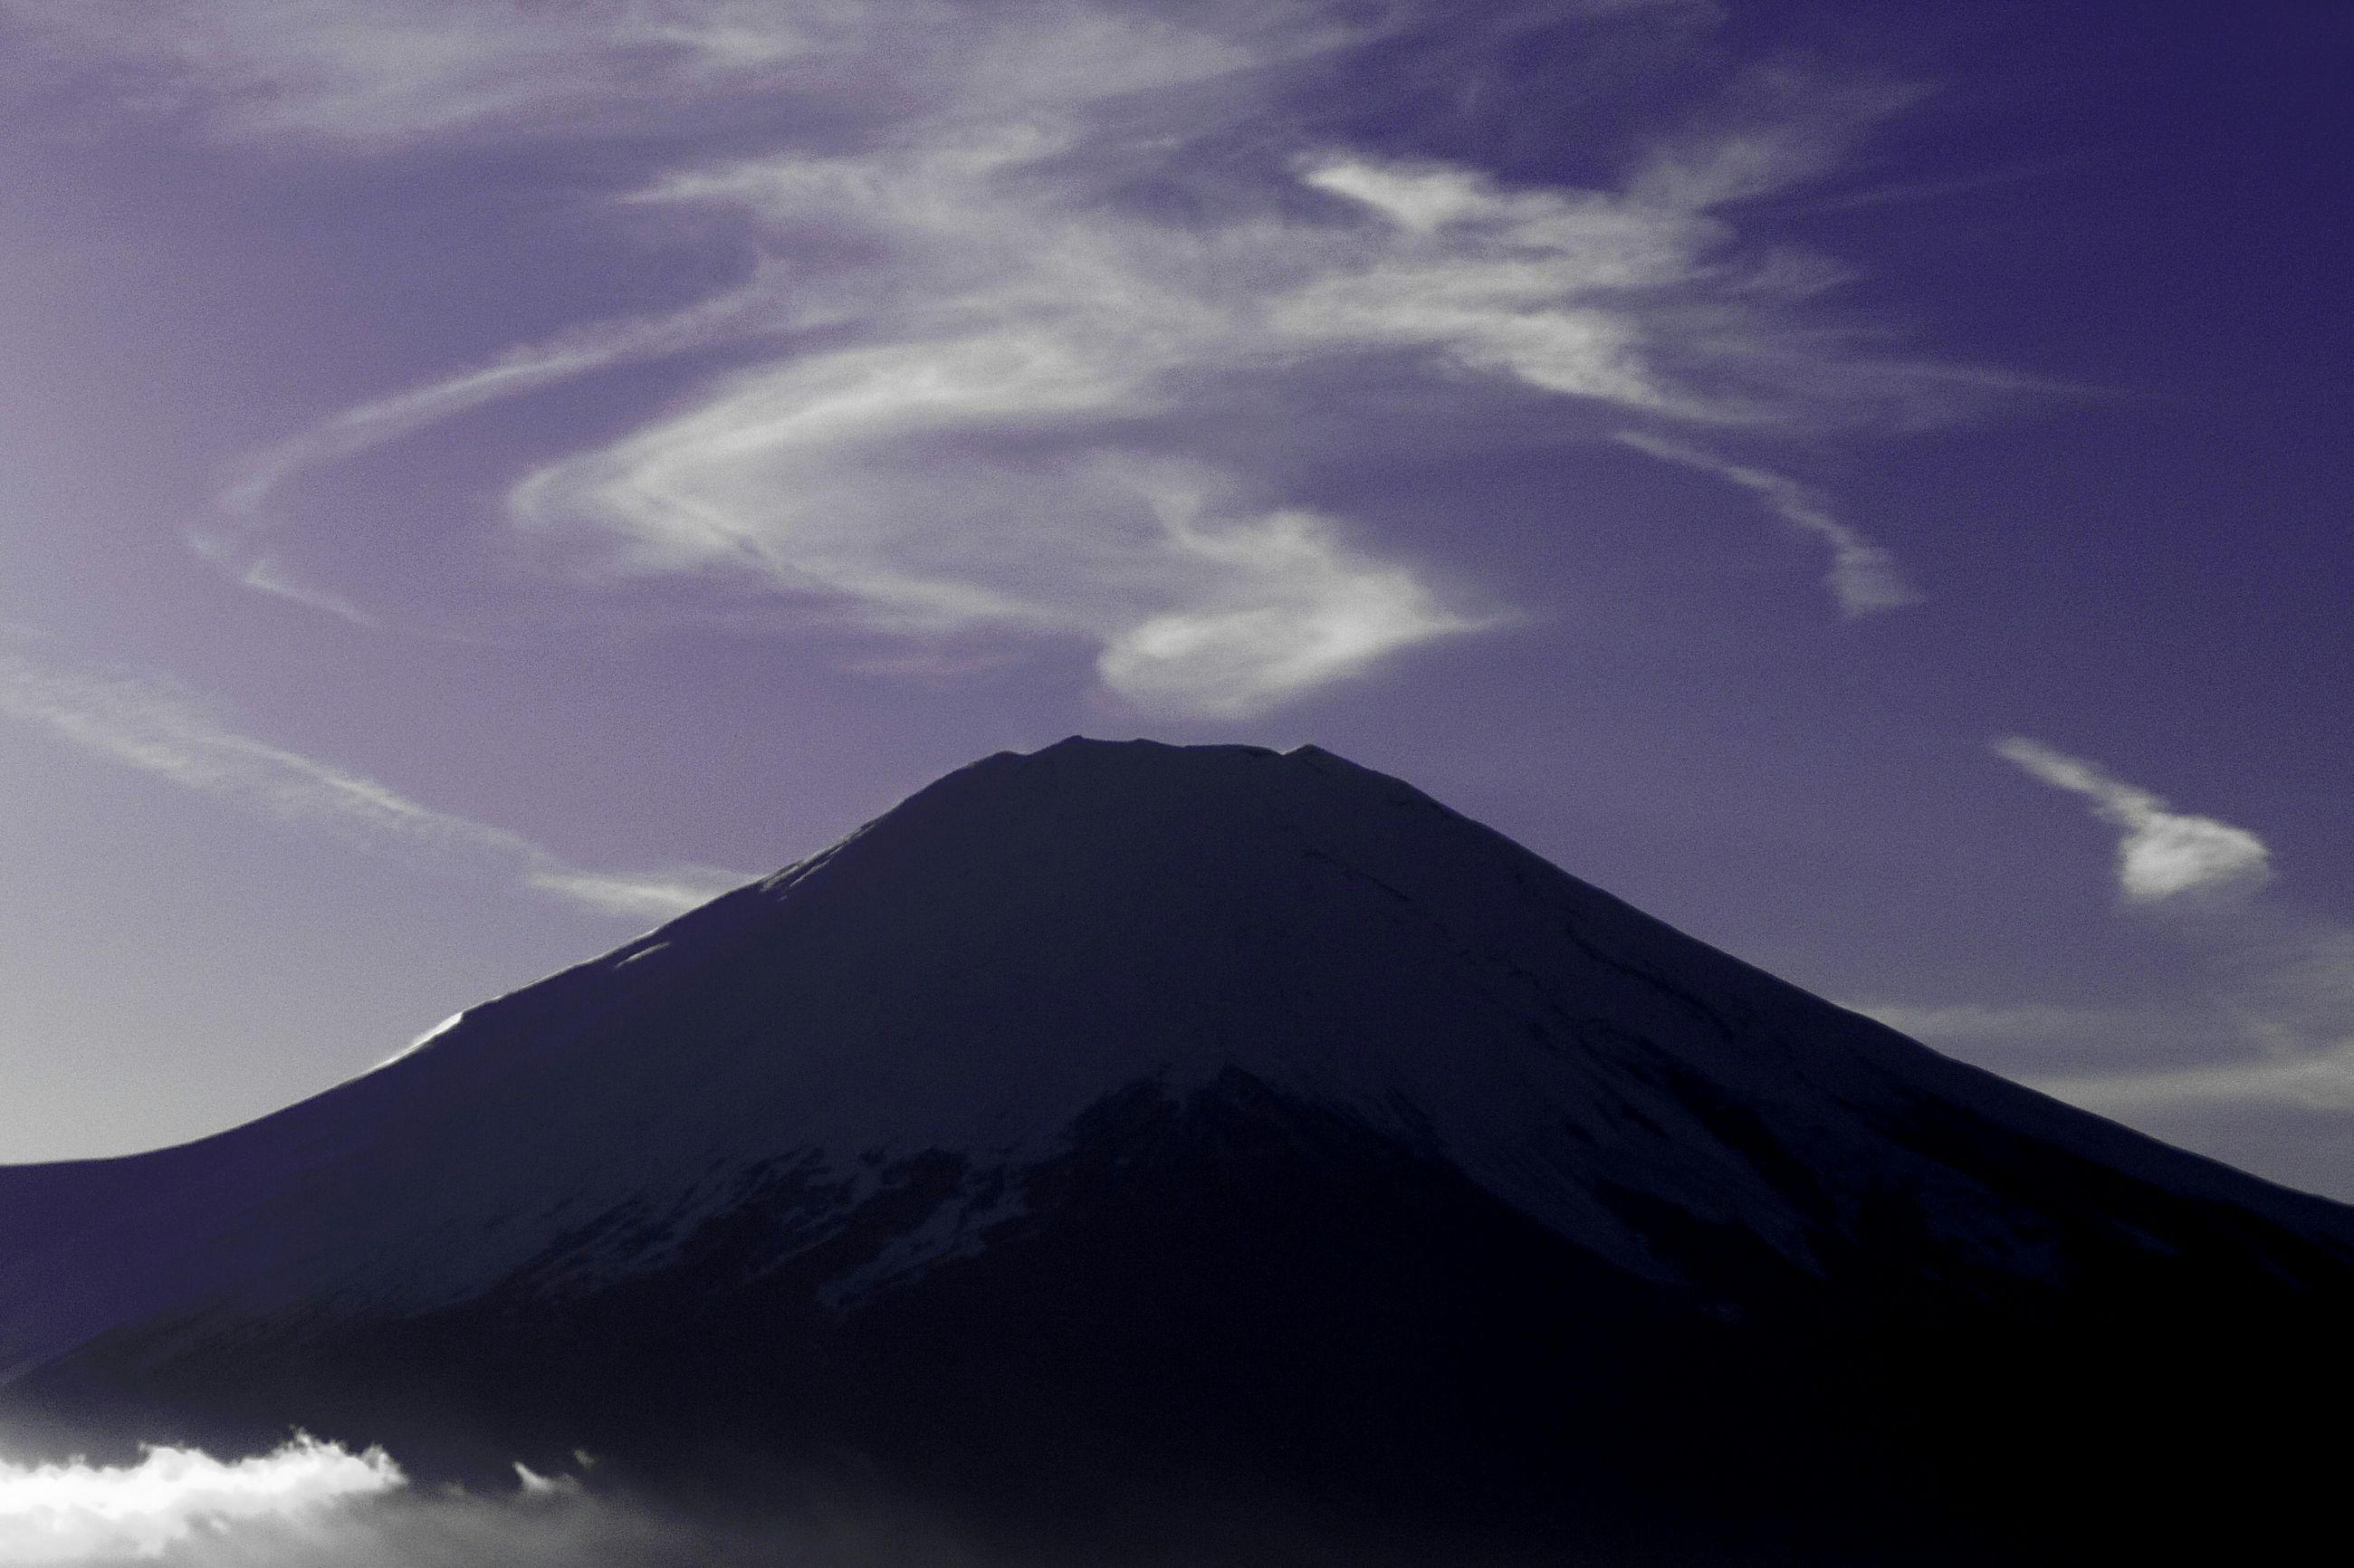 mountain, scenics, tranquil scene, tranquility, beauty in nature, mountain range, sky, nature, cloud - sky, idyllic, landscape, snow, majestic, weather, non-urban scene, winter, snowcapped mountain, cold temperature, cloud, blue